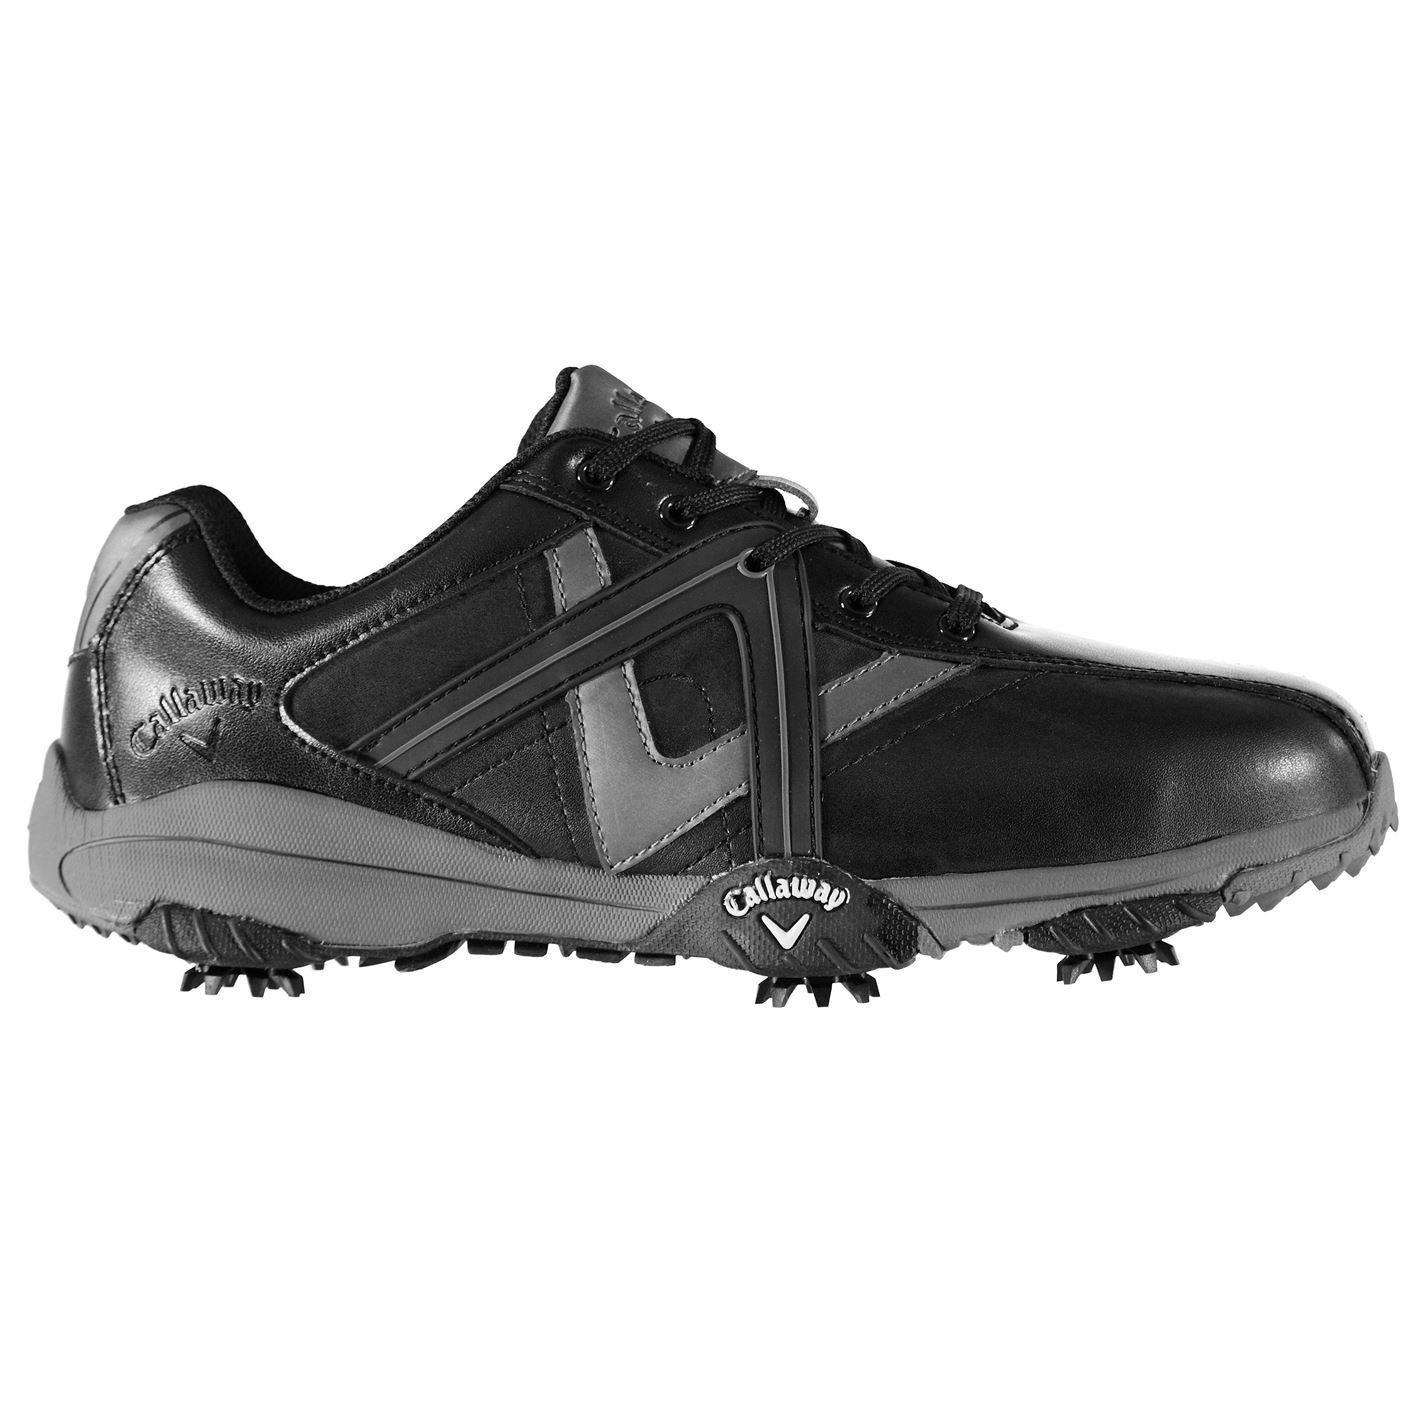 Callaway-Cheviot-ll-Golf-Shoes-Mens-Spikes-Footwear thumbnail 5